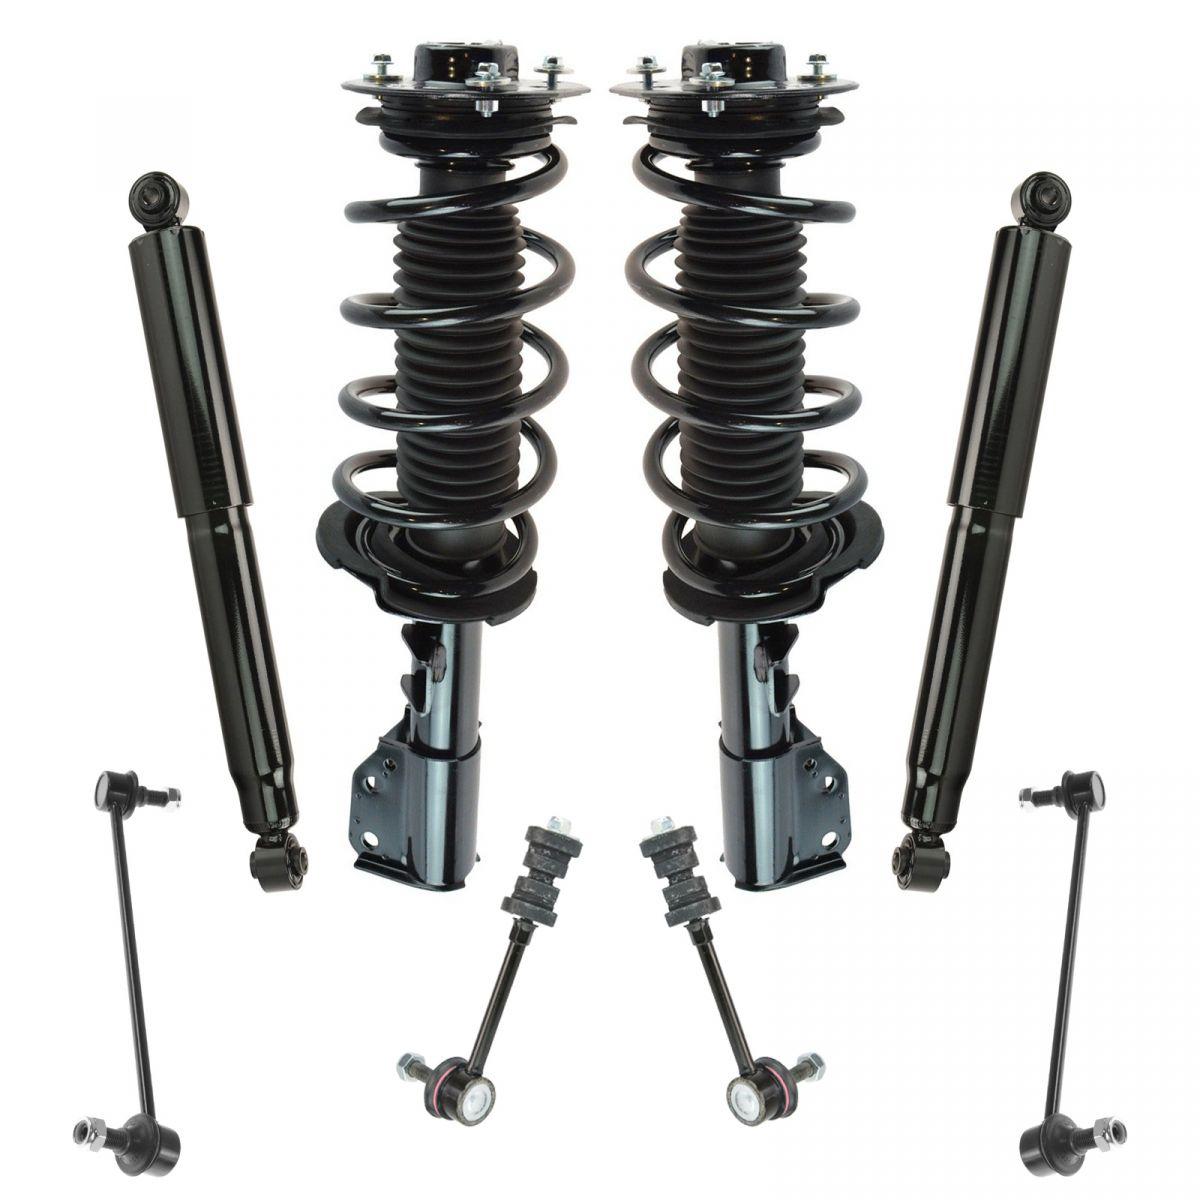 4 Piece Front Strut /& Spring Assemblies Sway Bar Links Kit for Honda Accord